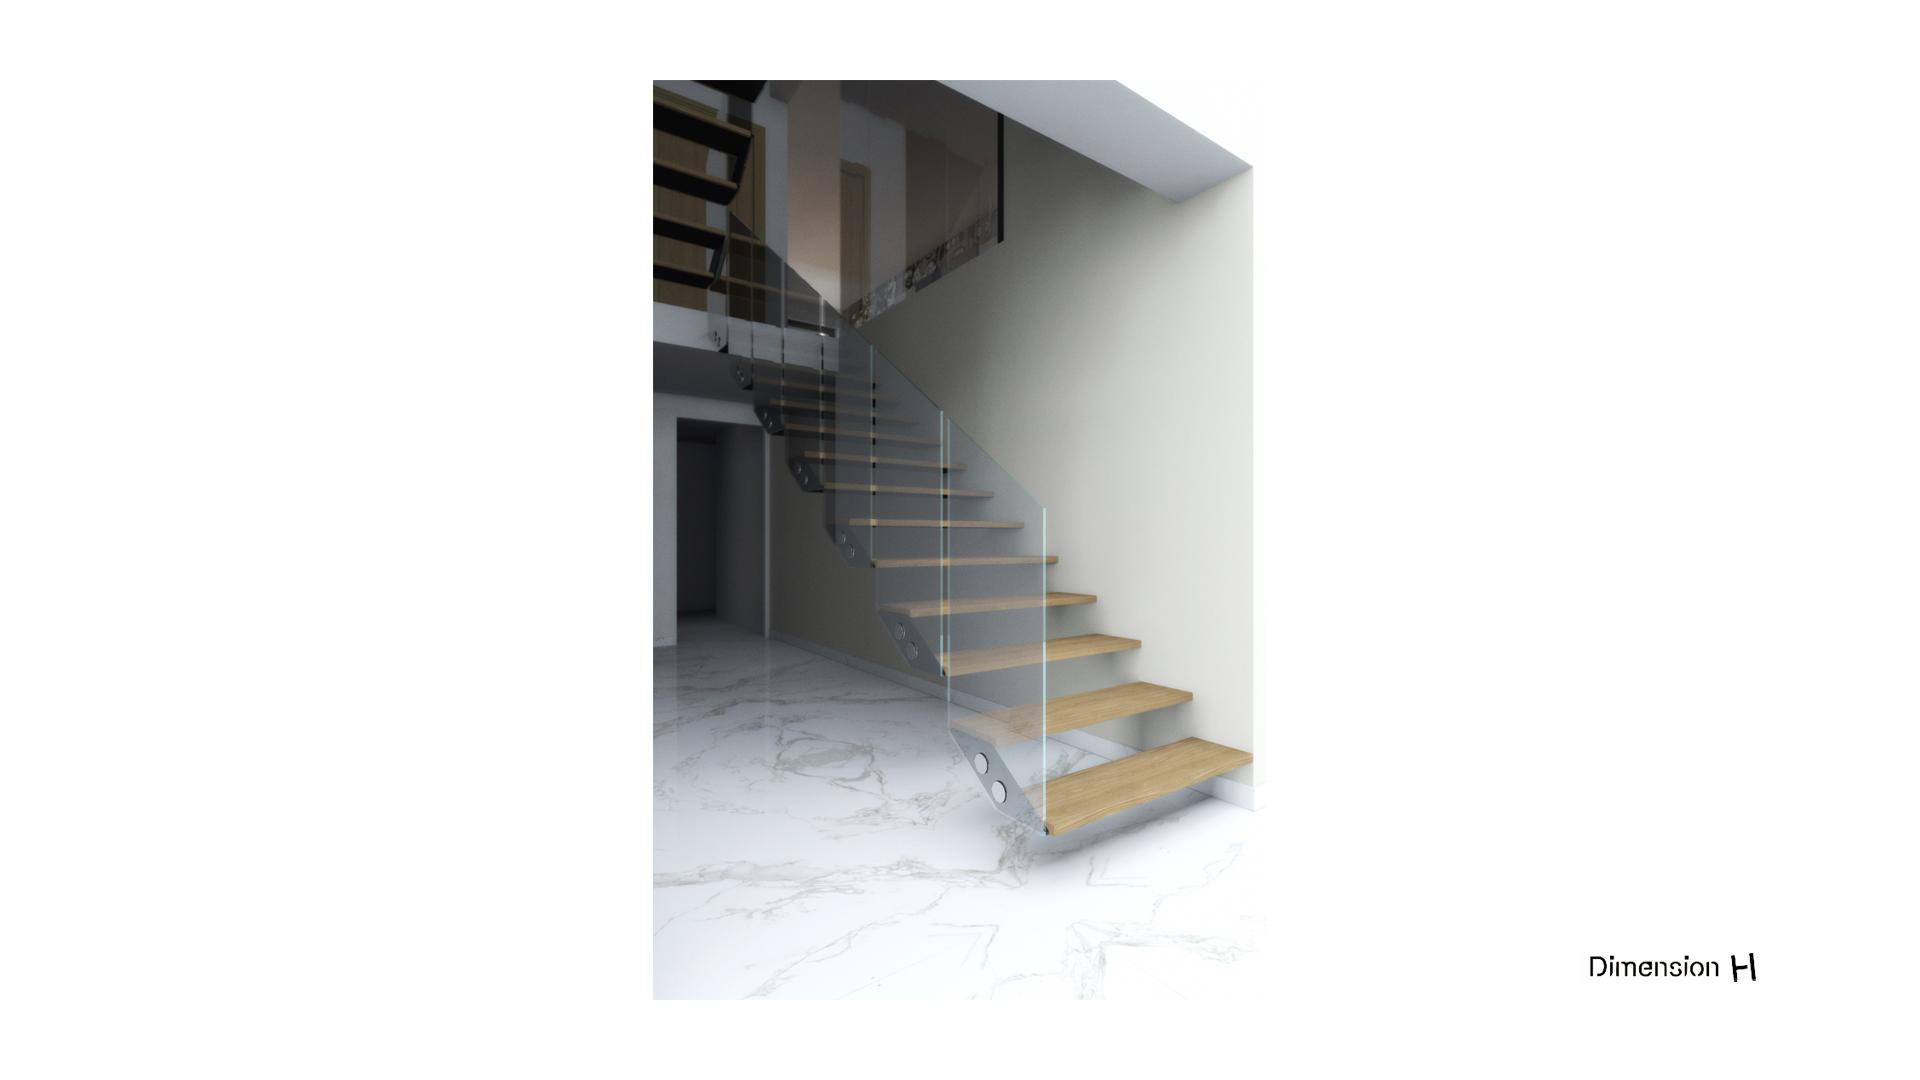 escalier_bois_metal_sol_dekton_aura